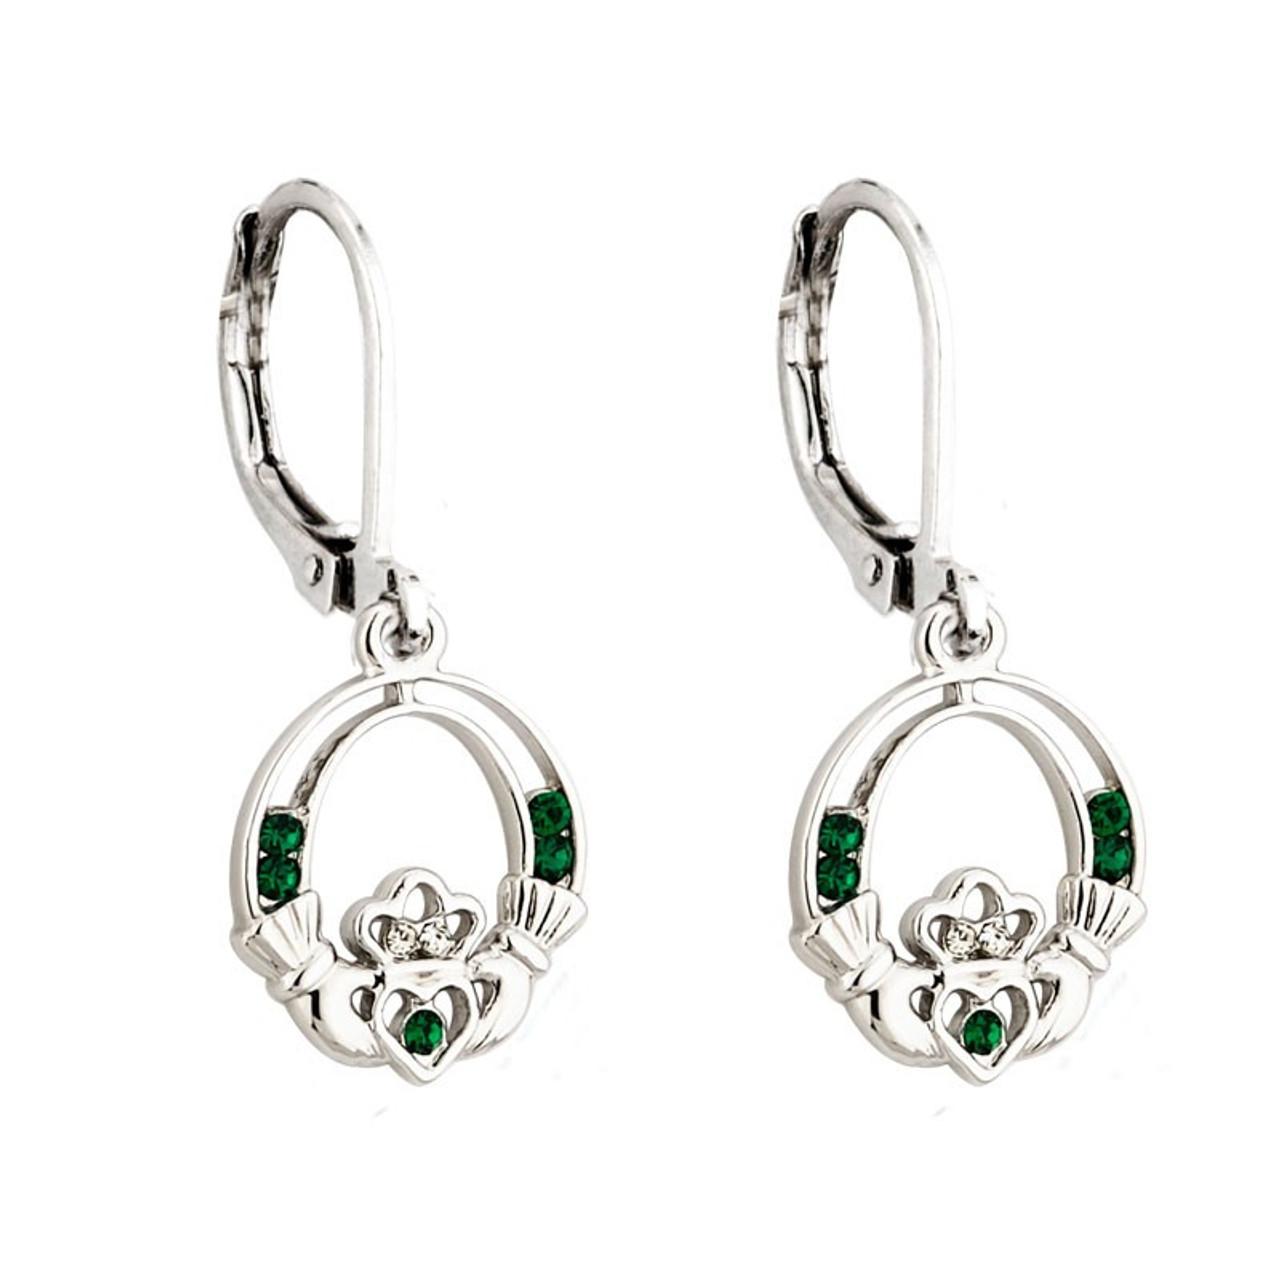 Rhodium Plated Crystal Claddagh Earrings